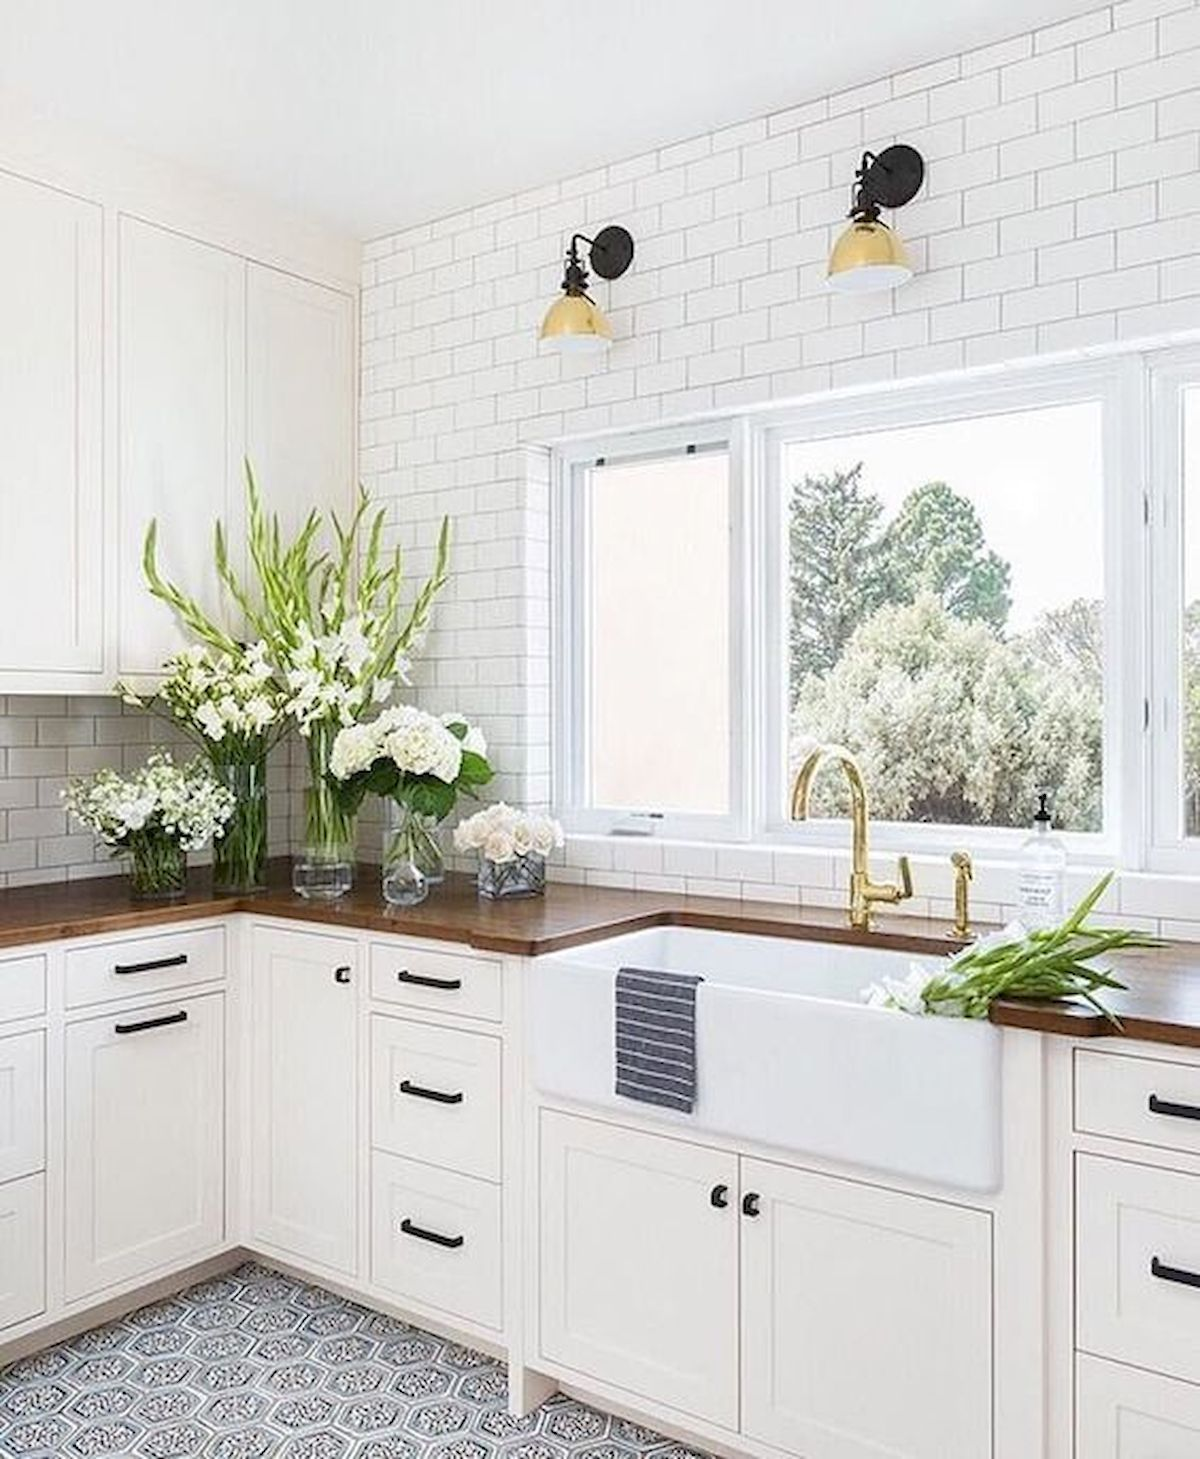 Pin by Lilja on Future Home   Kitchen sink design, Farmhouse style ...